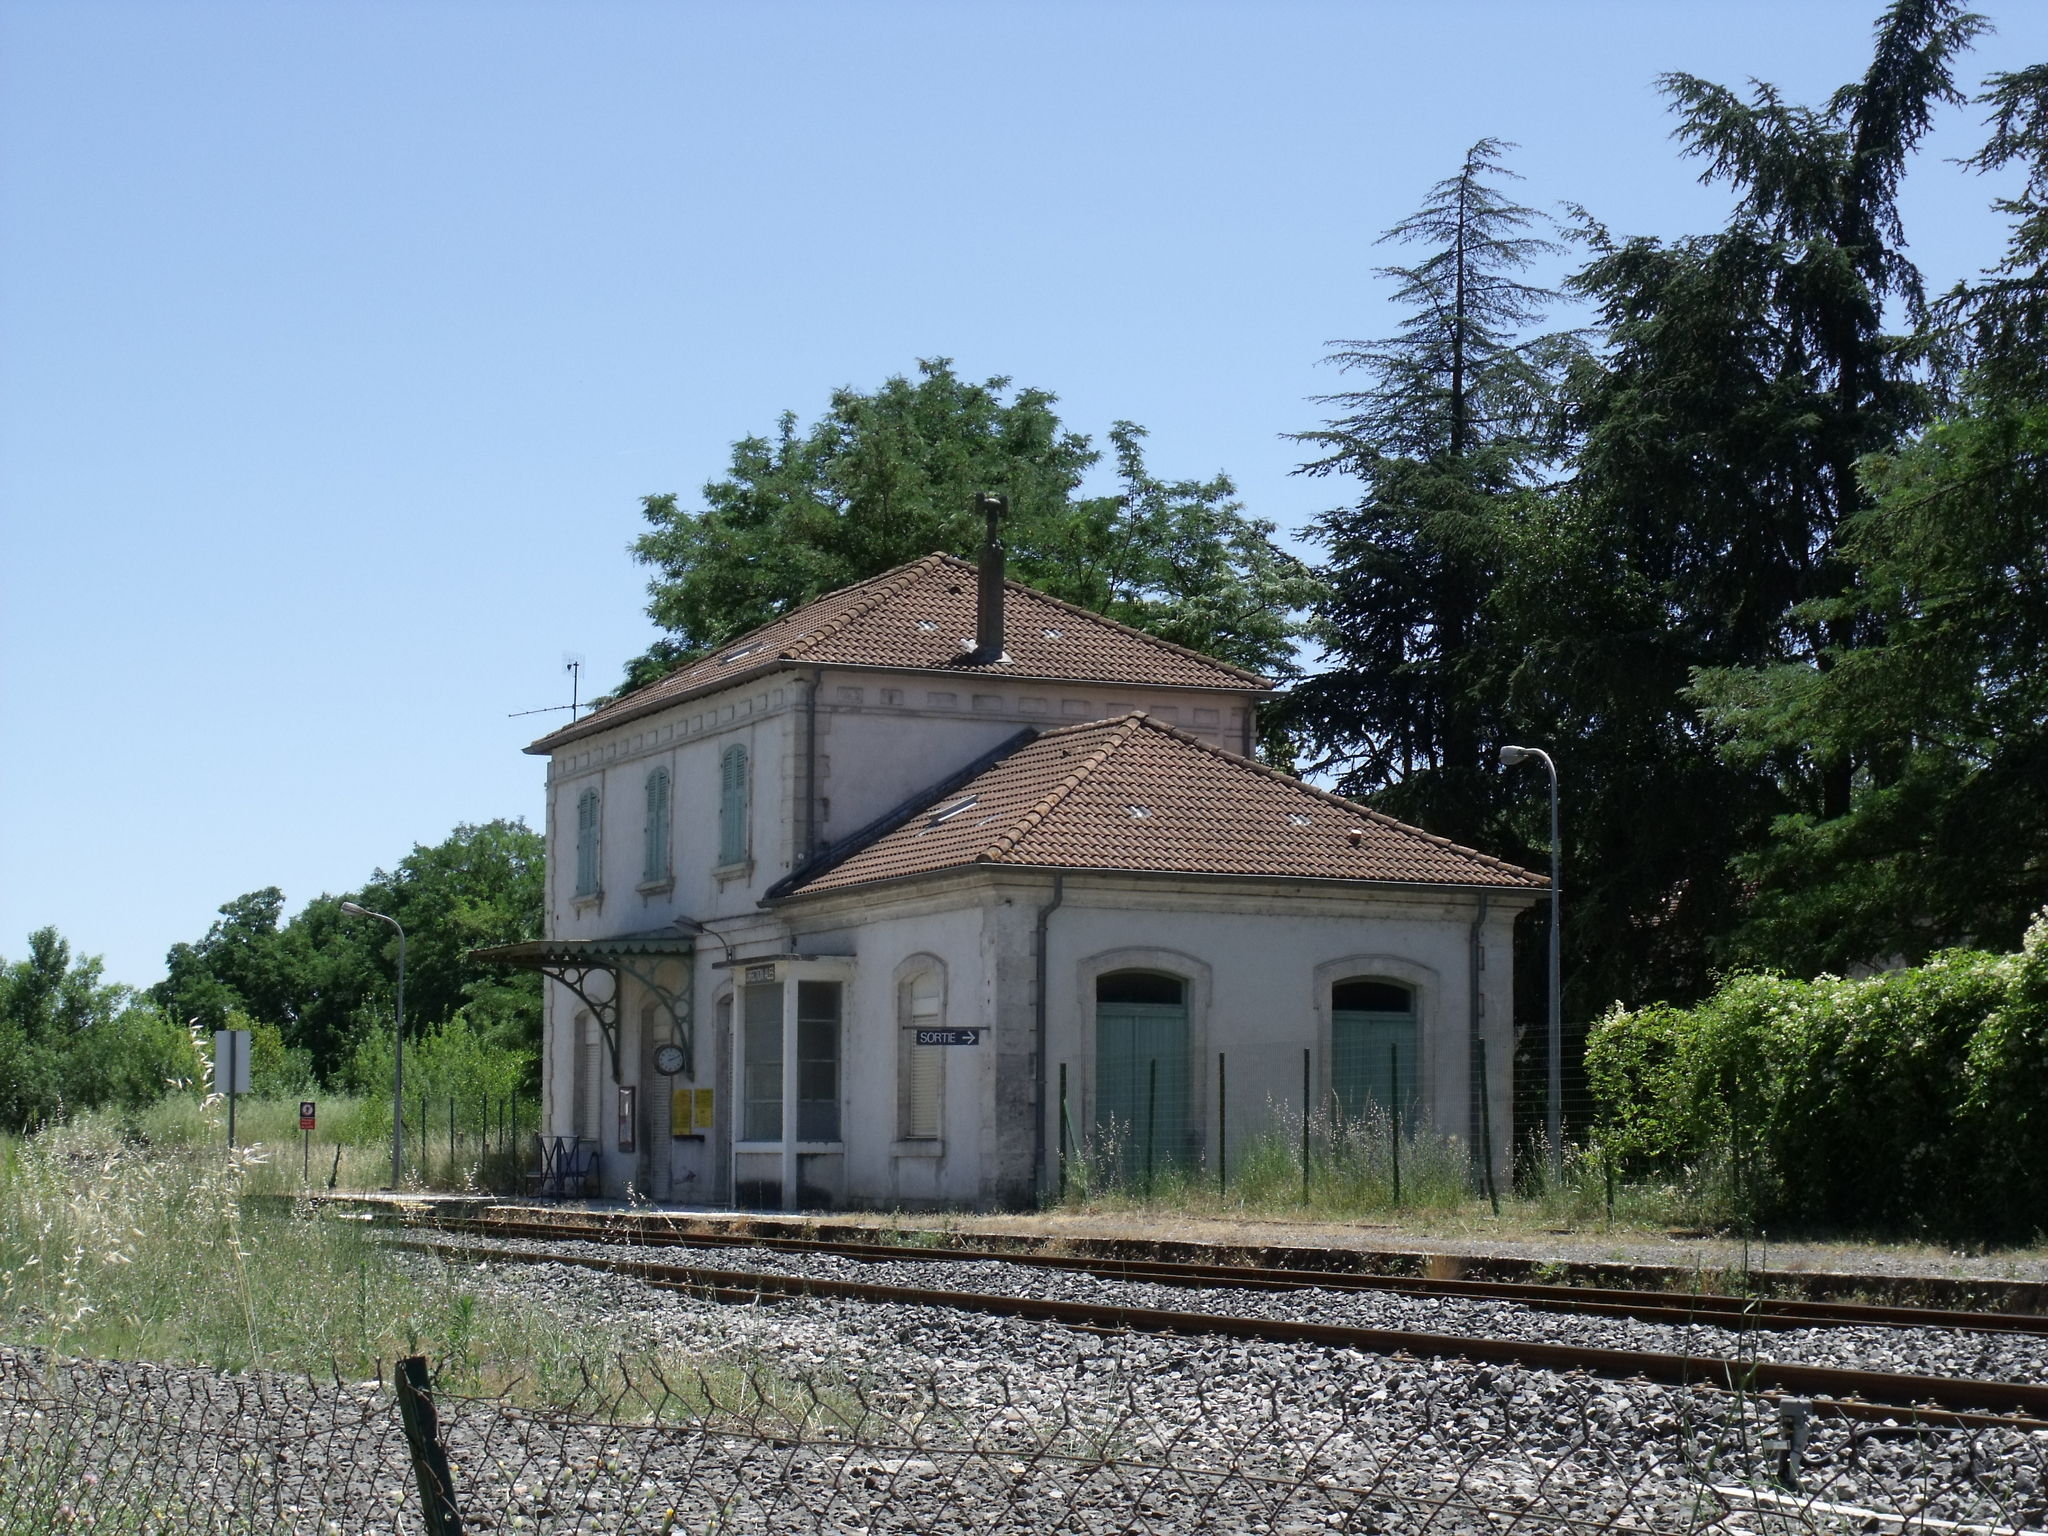 Nozières Brignon (Gard)